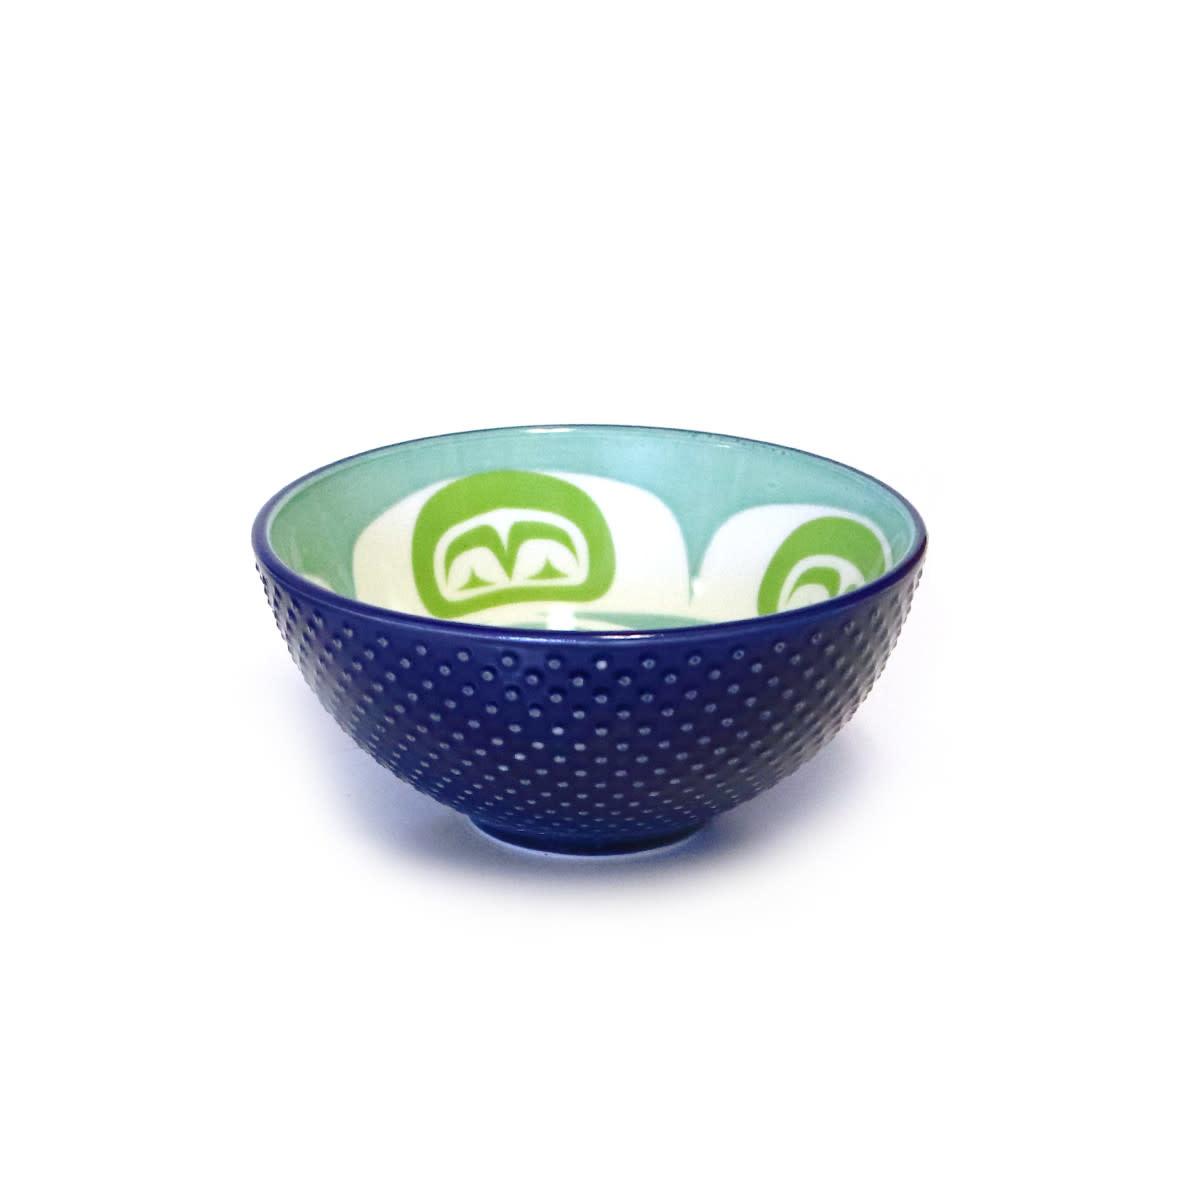 Porcelain Art Bowl - Small-1